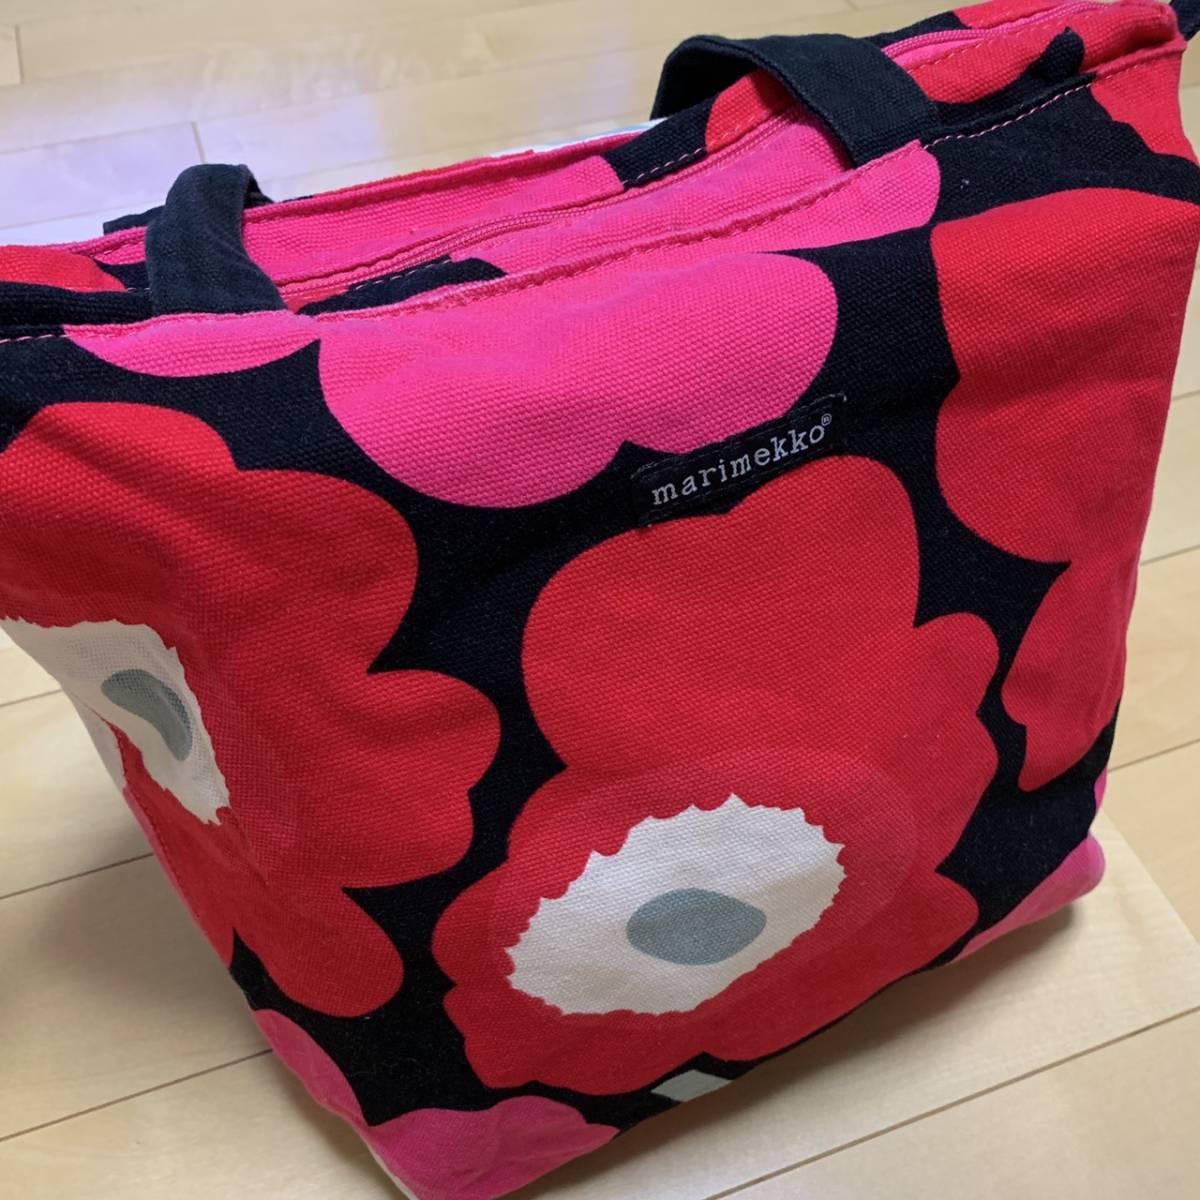 marimekko マリメッコ トートバッグ キャンバス 花柄 マザーズバッグ_画像5